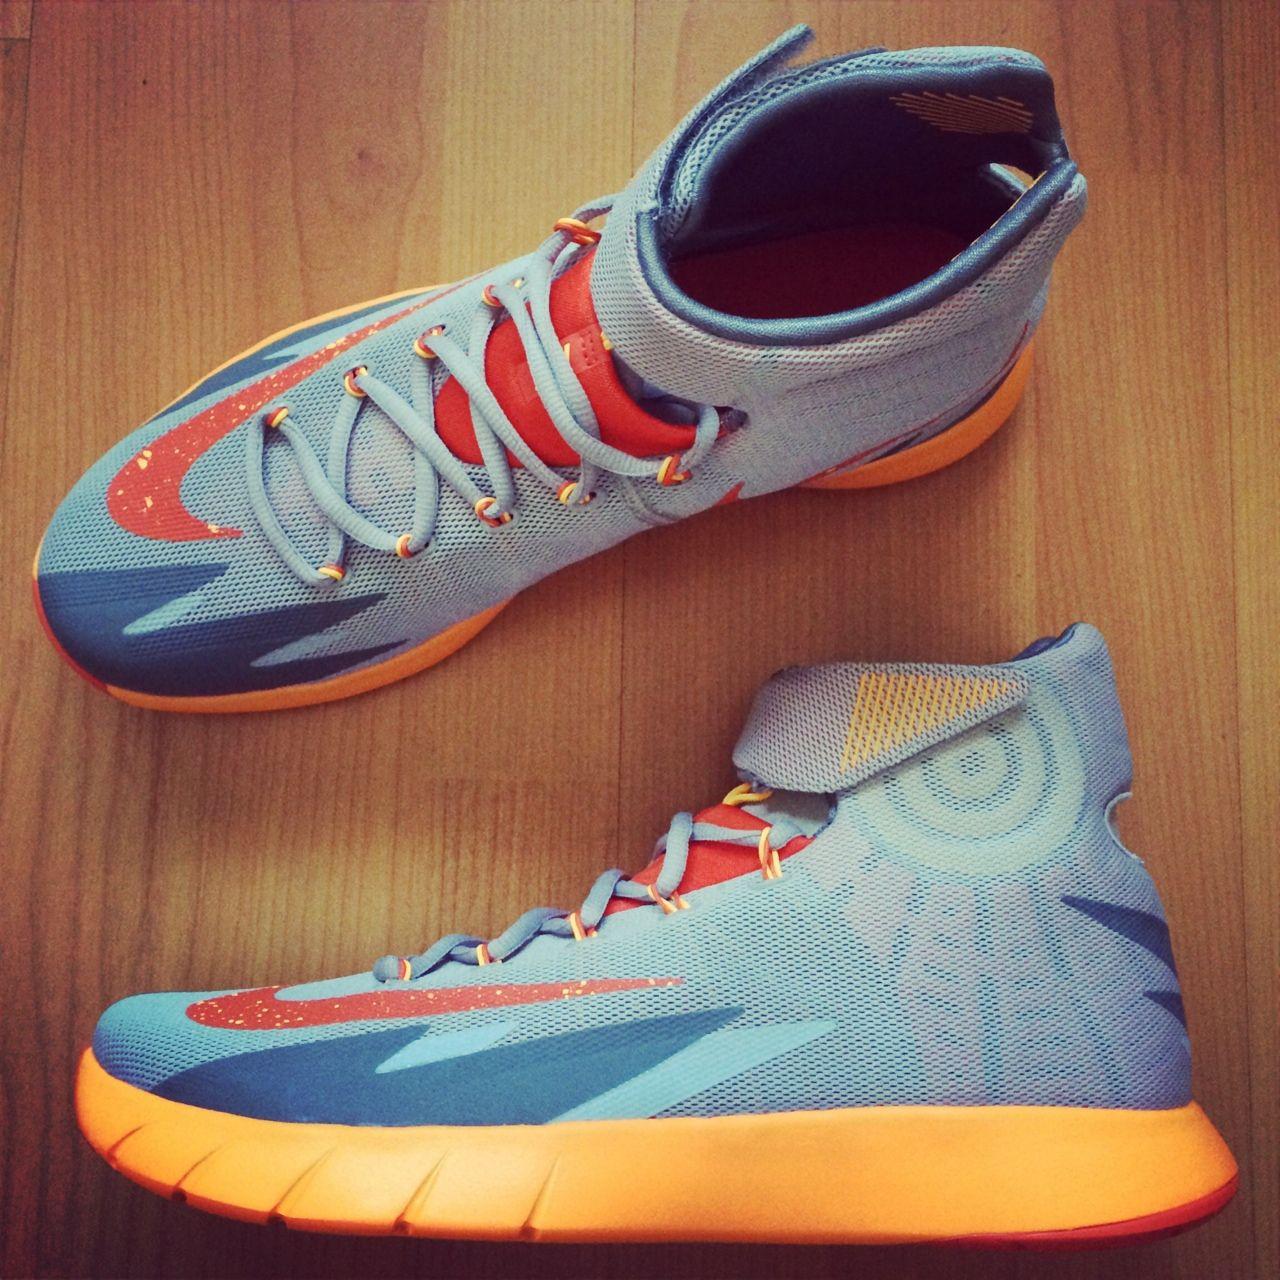 9b53a1b5f40 Nike HyperRev Hitting Retail in Black Volt (2)